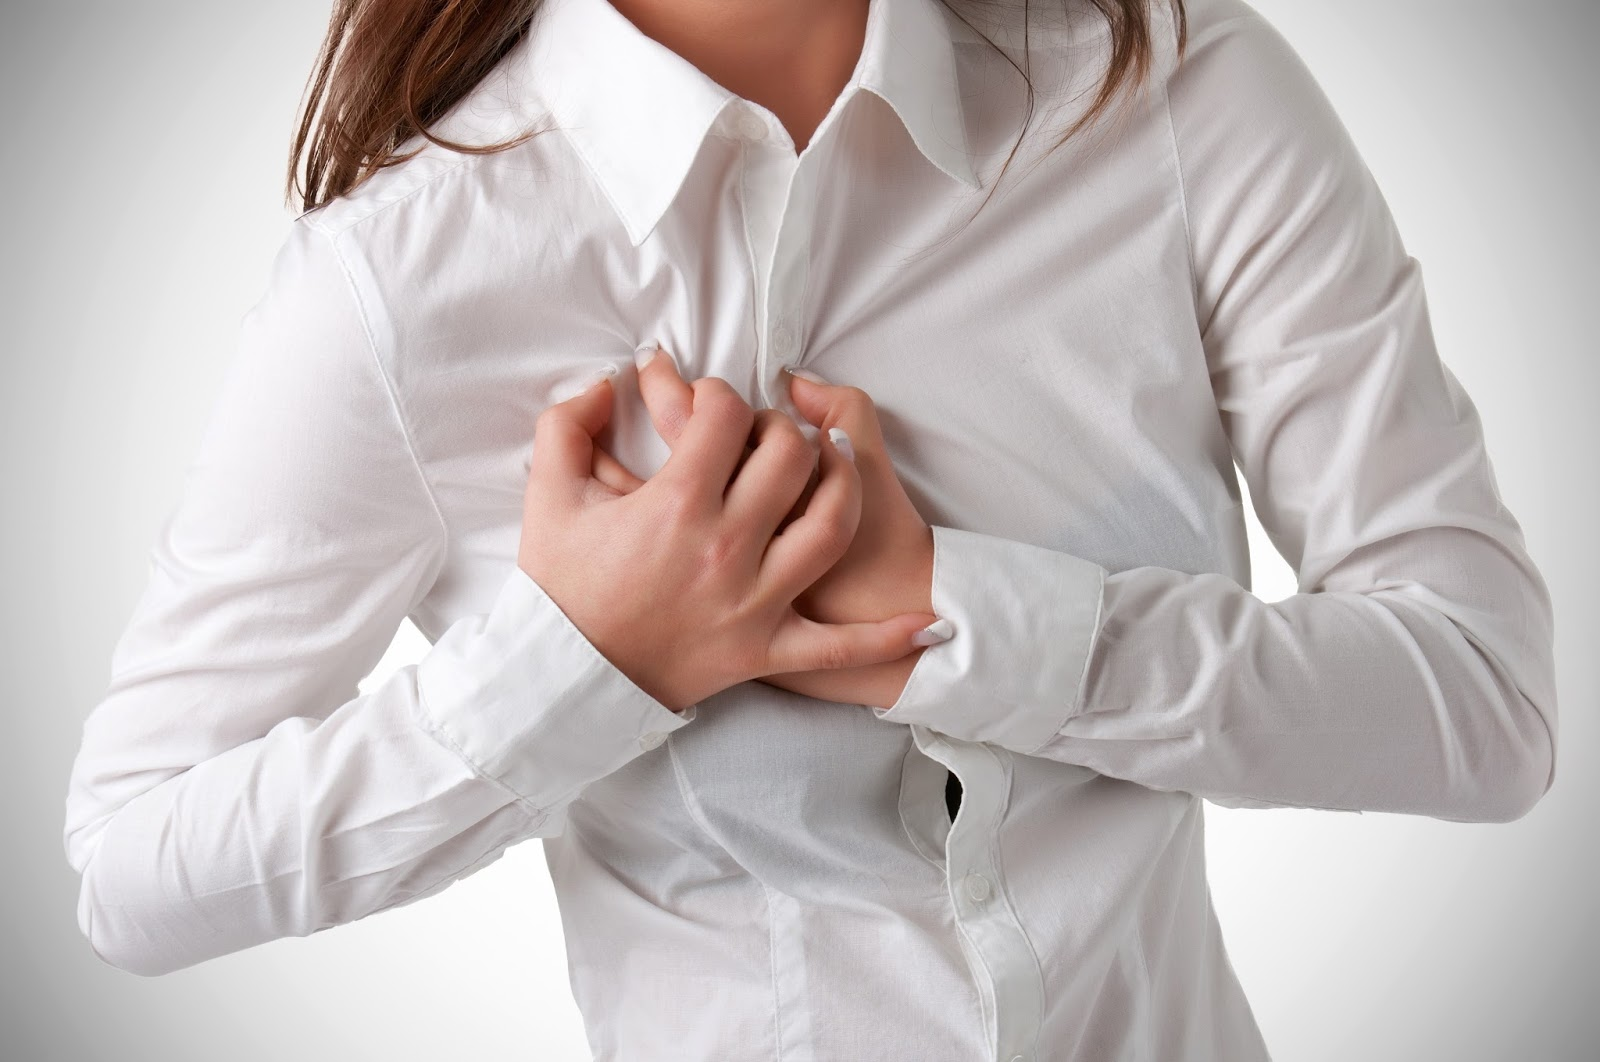 Gejala dan Penyebab Penyakit Jantung Koroner